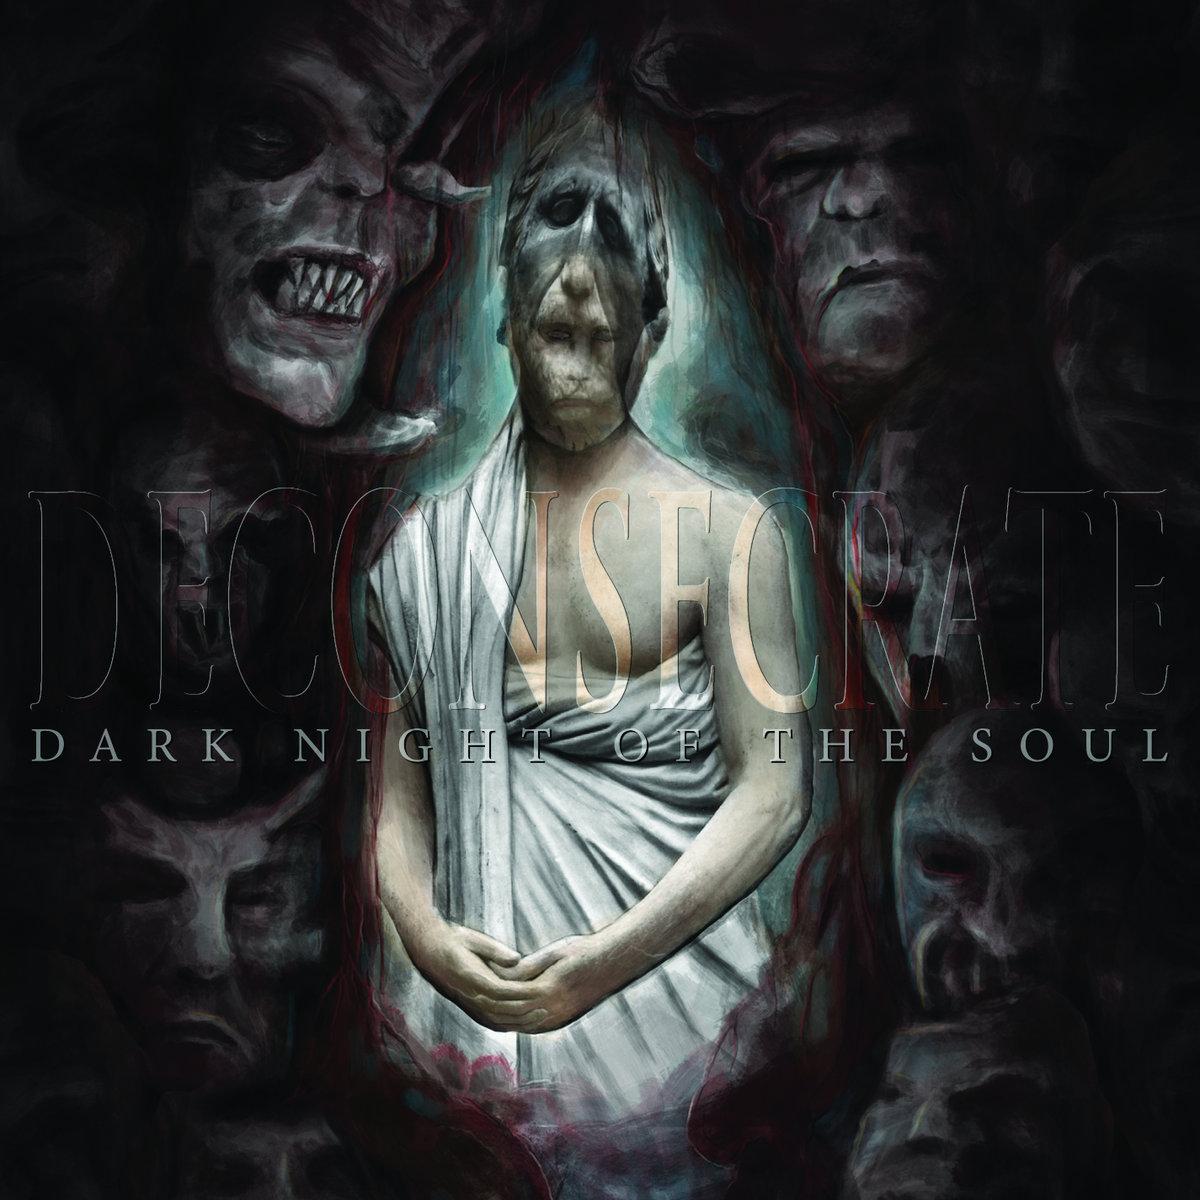 Deconsecrate - Dark Night of the Soul